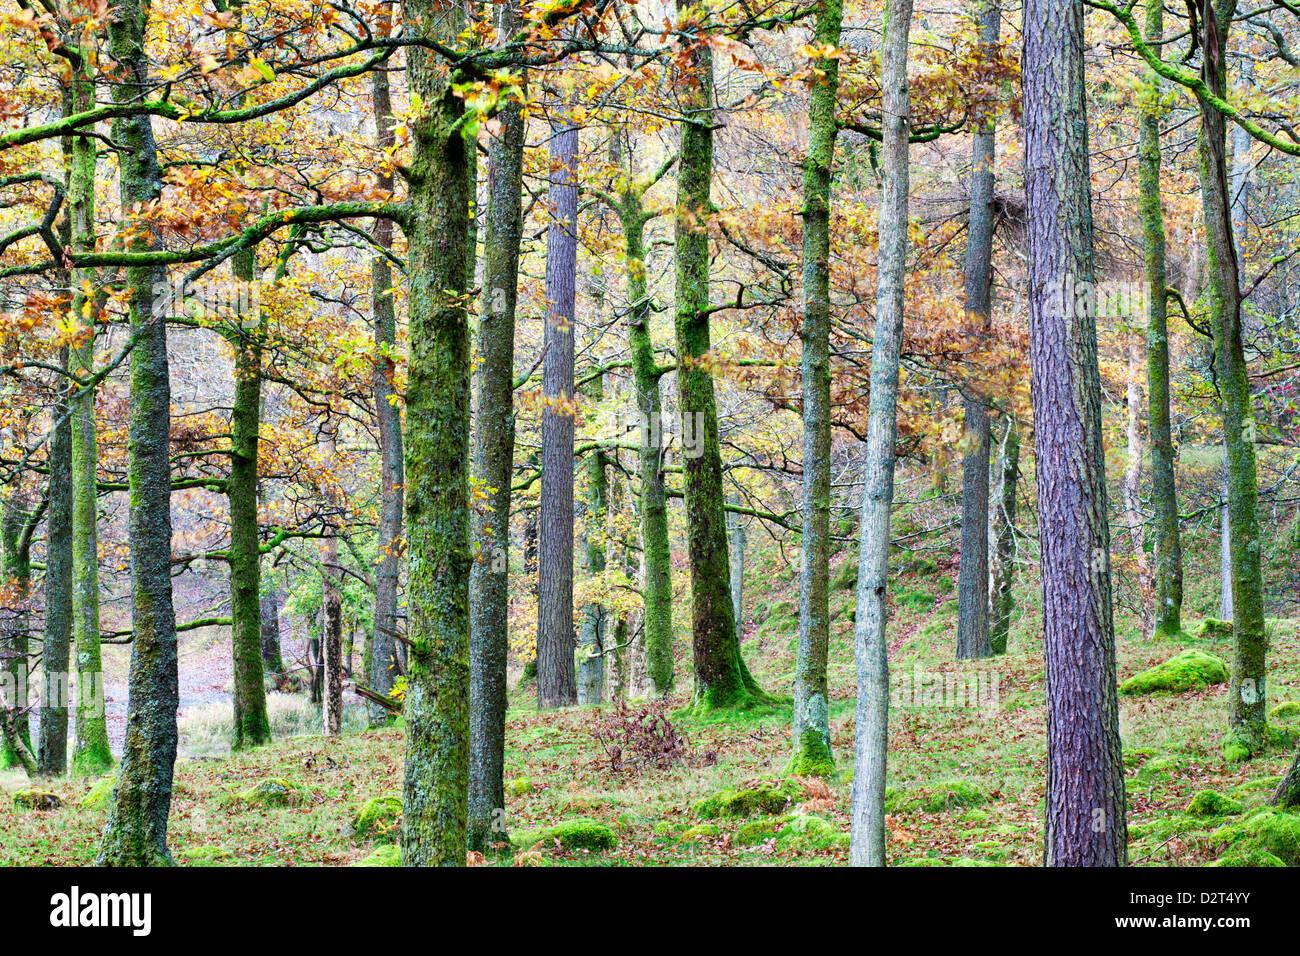 Pine trees in woodland near Grange, Borrowdale, Lake District National Park, Cumbria, England, United Kingdom, Europe - Stock Image